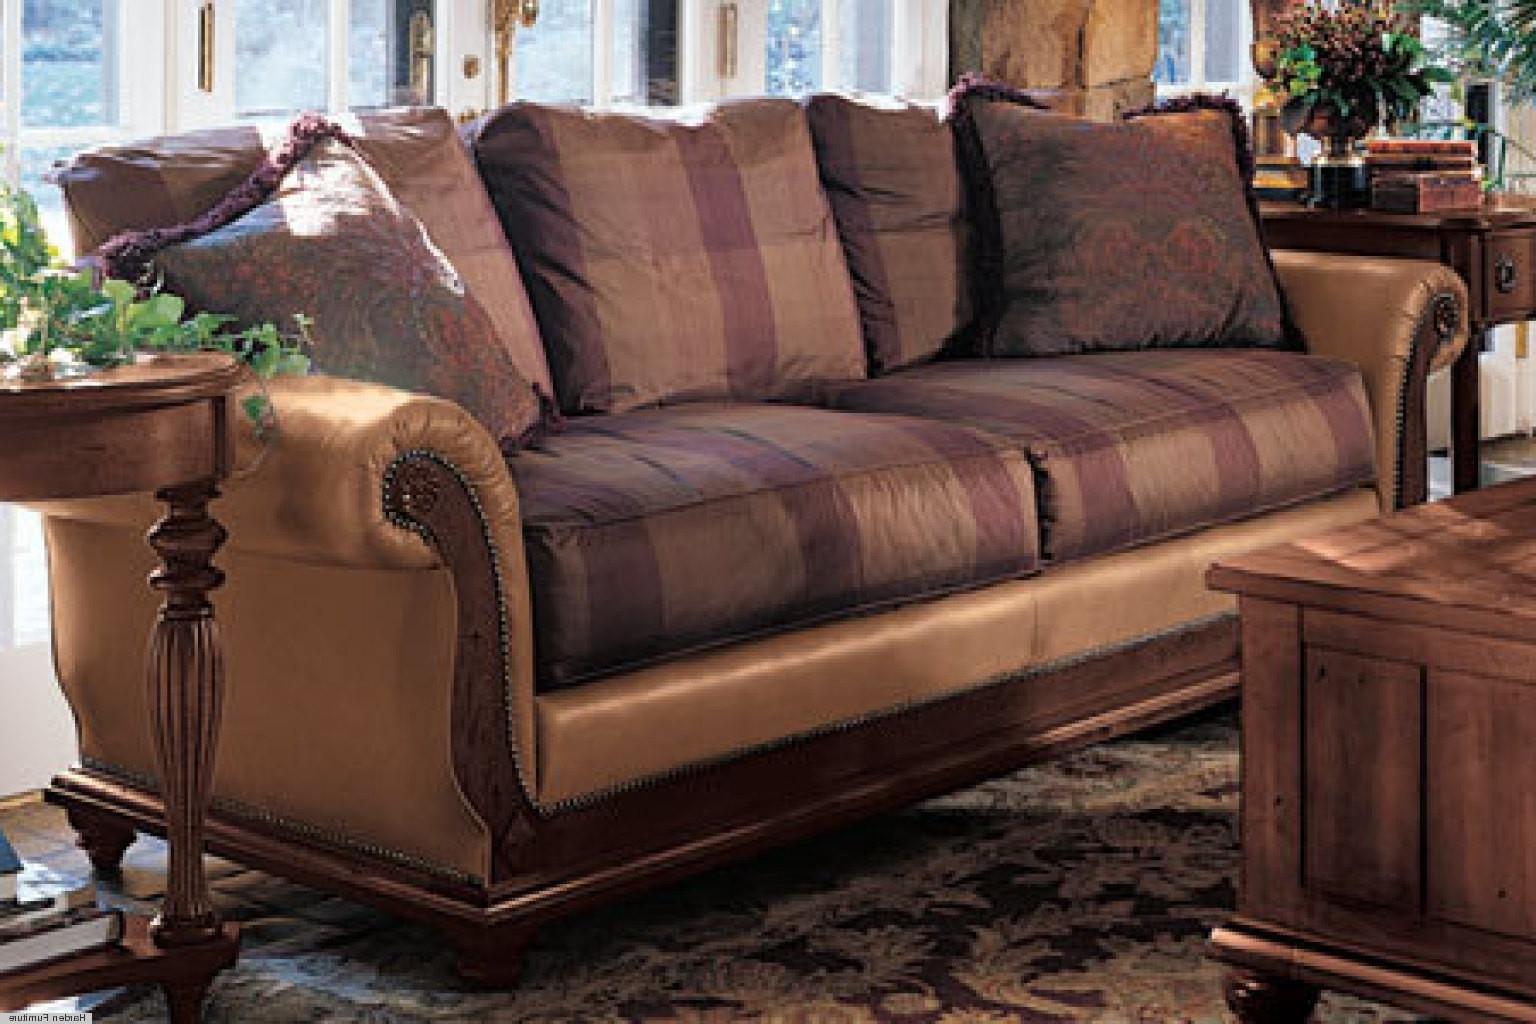 Preferred Dallas Texas Sectional Sofas Regarding Craigslist Dallas Texas Furniture (View 15 of 20)